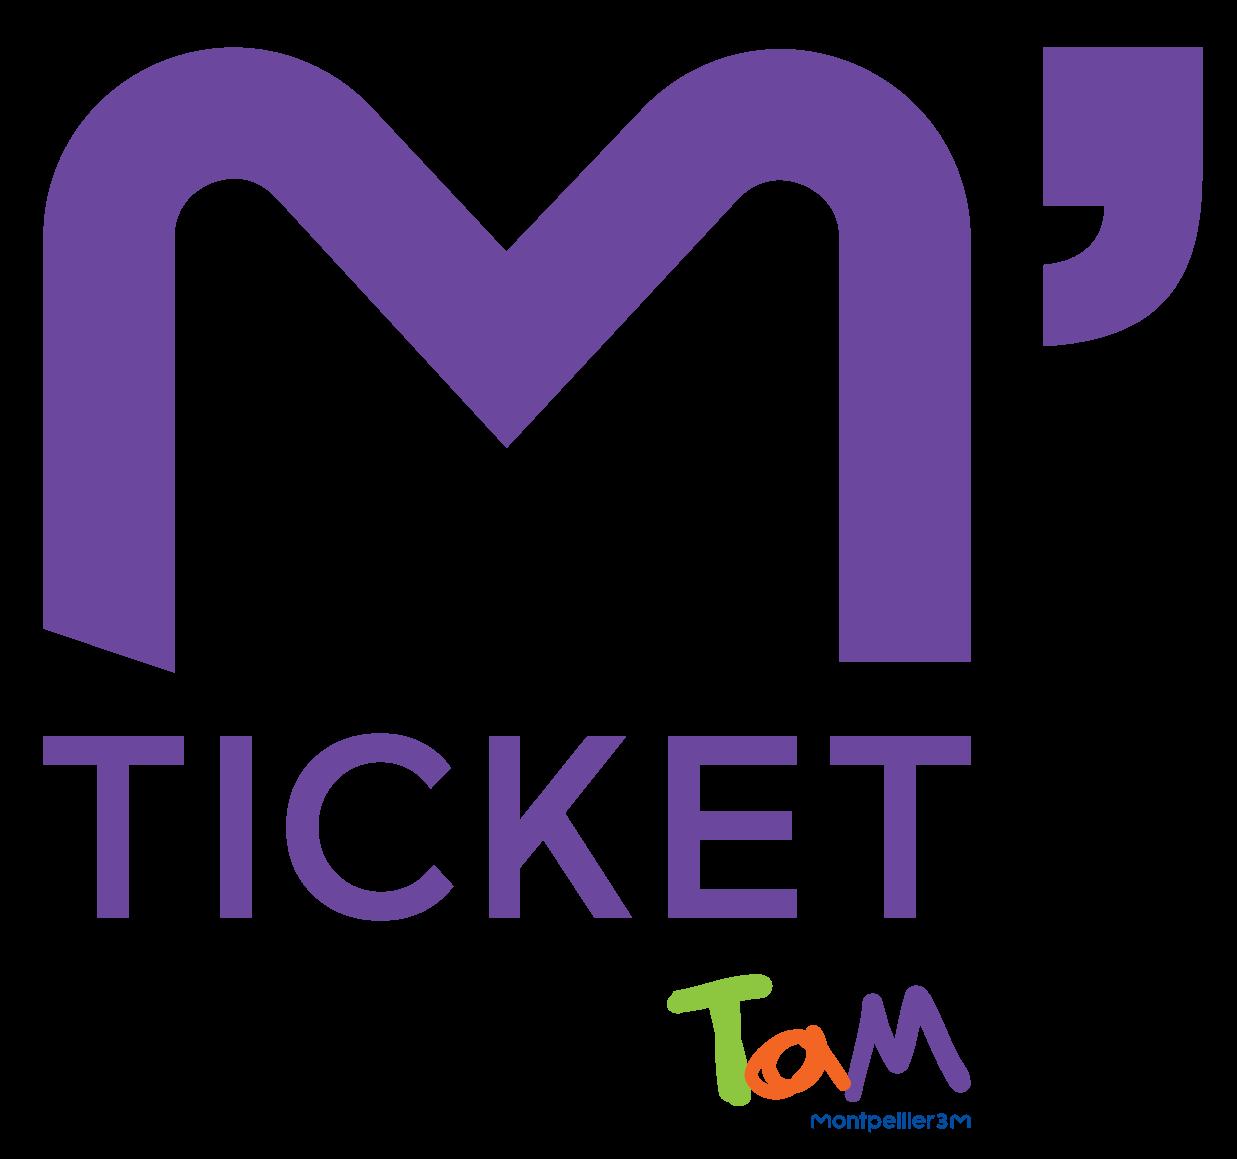 logo application m'ticket tam